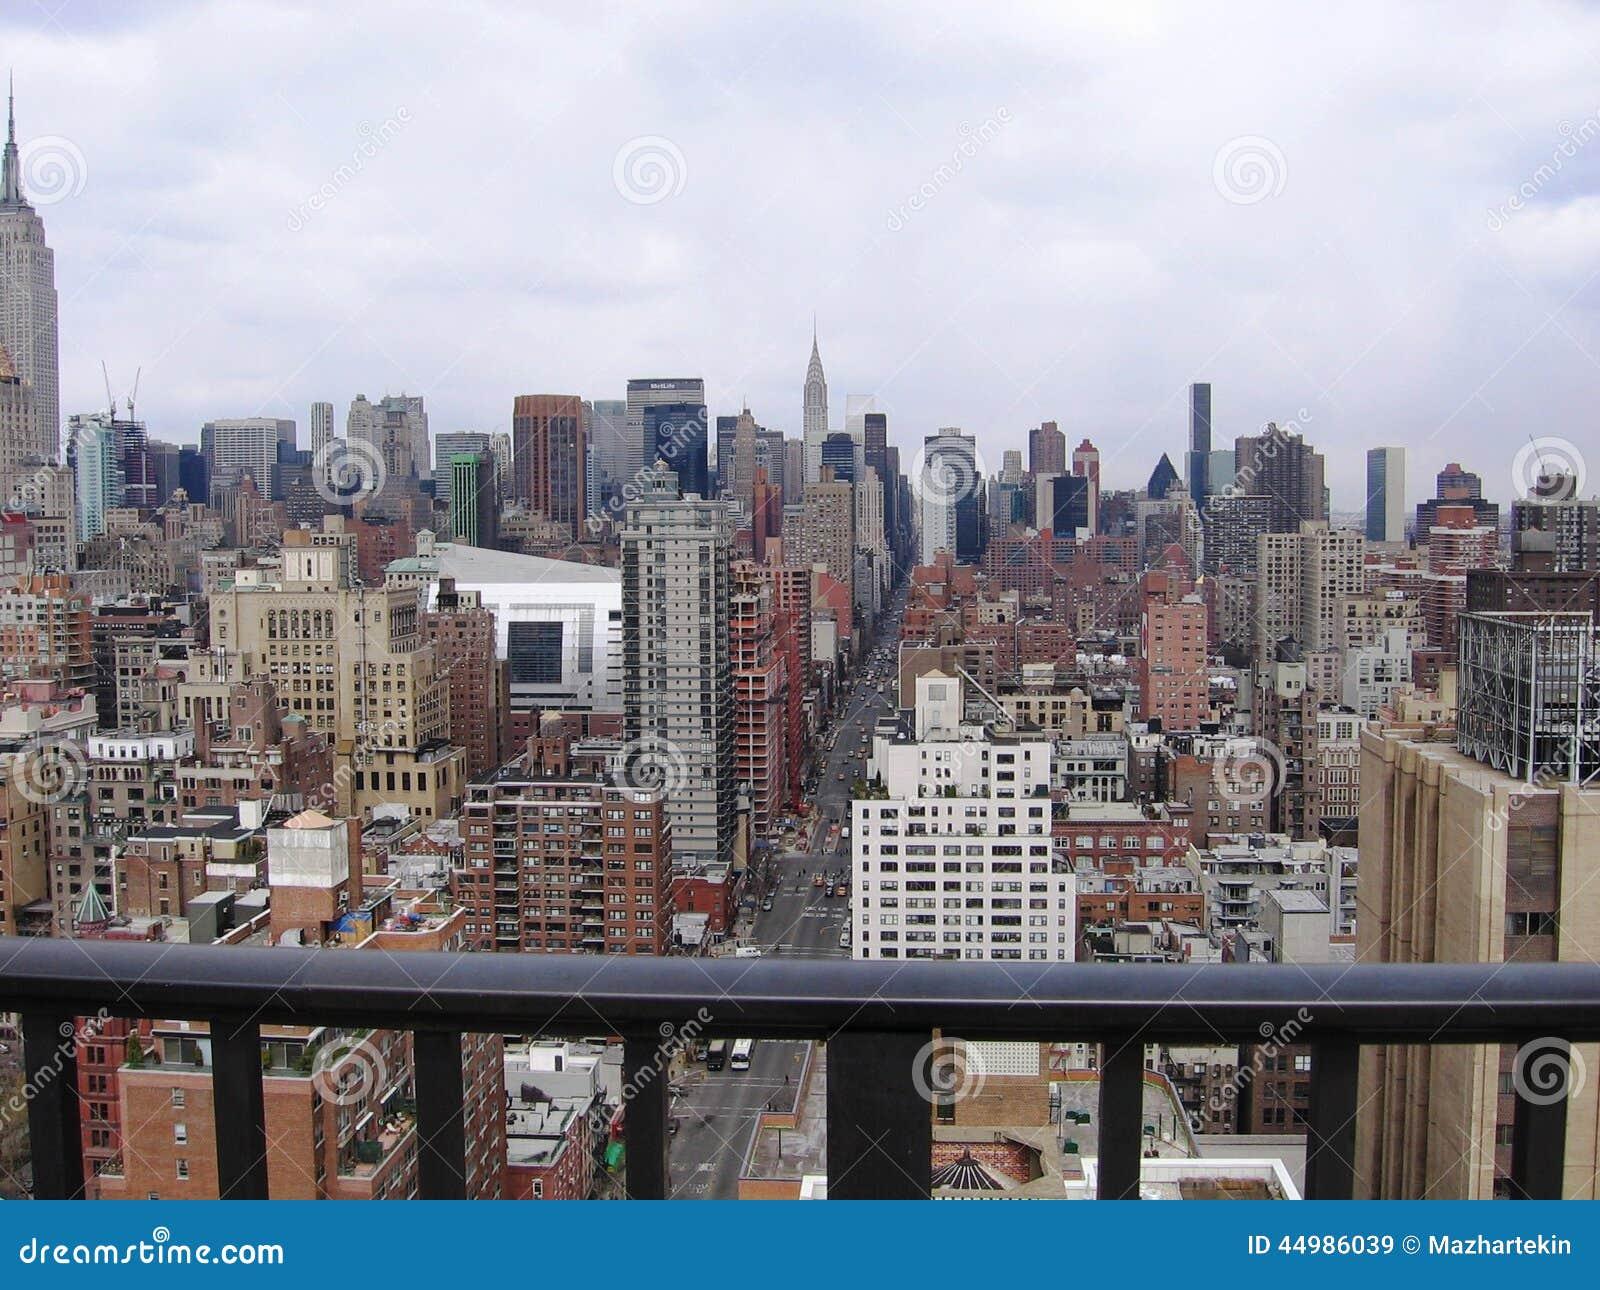 New york city view from the hotel balcony stock photo for Balcony new york